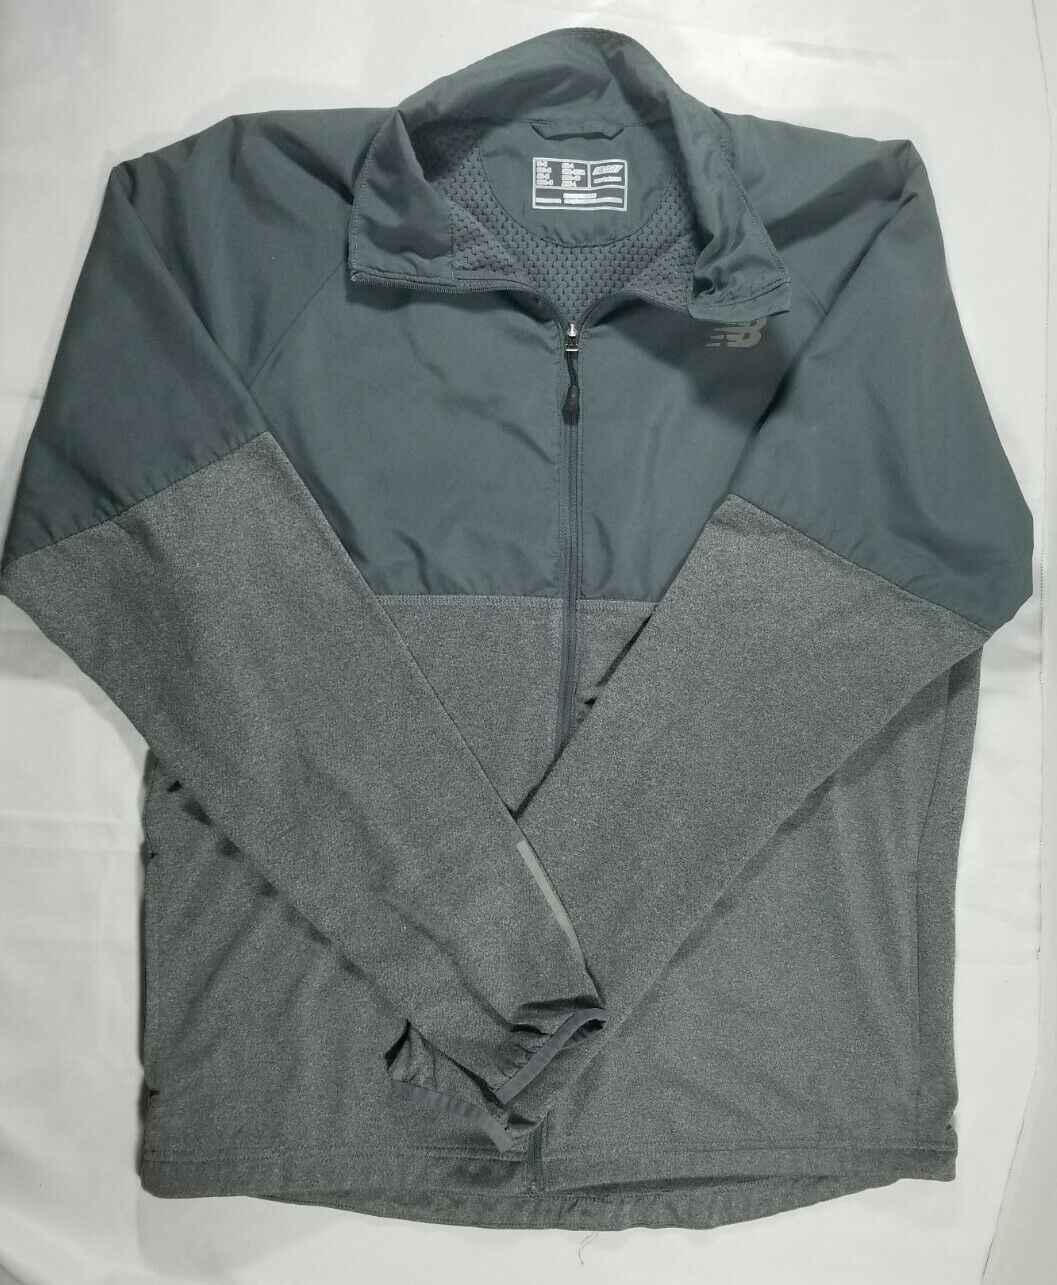 New Balance Dry Womens Jacket Size Medium